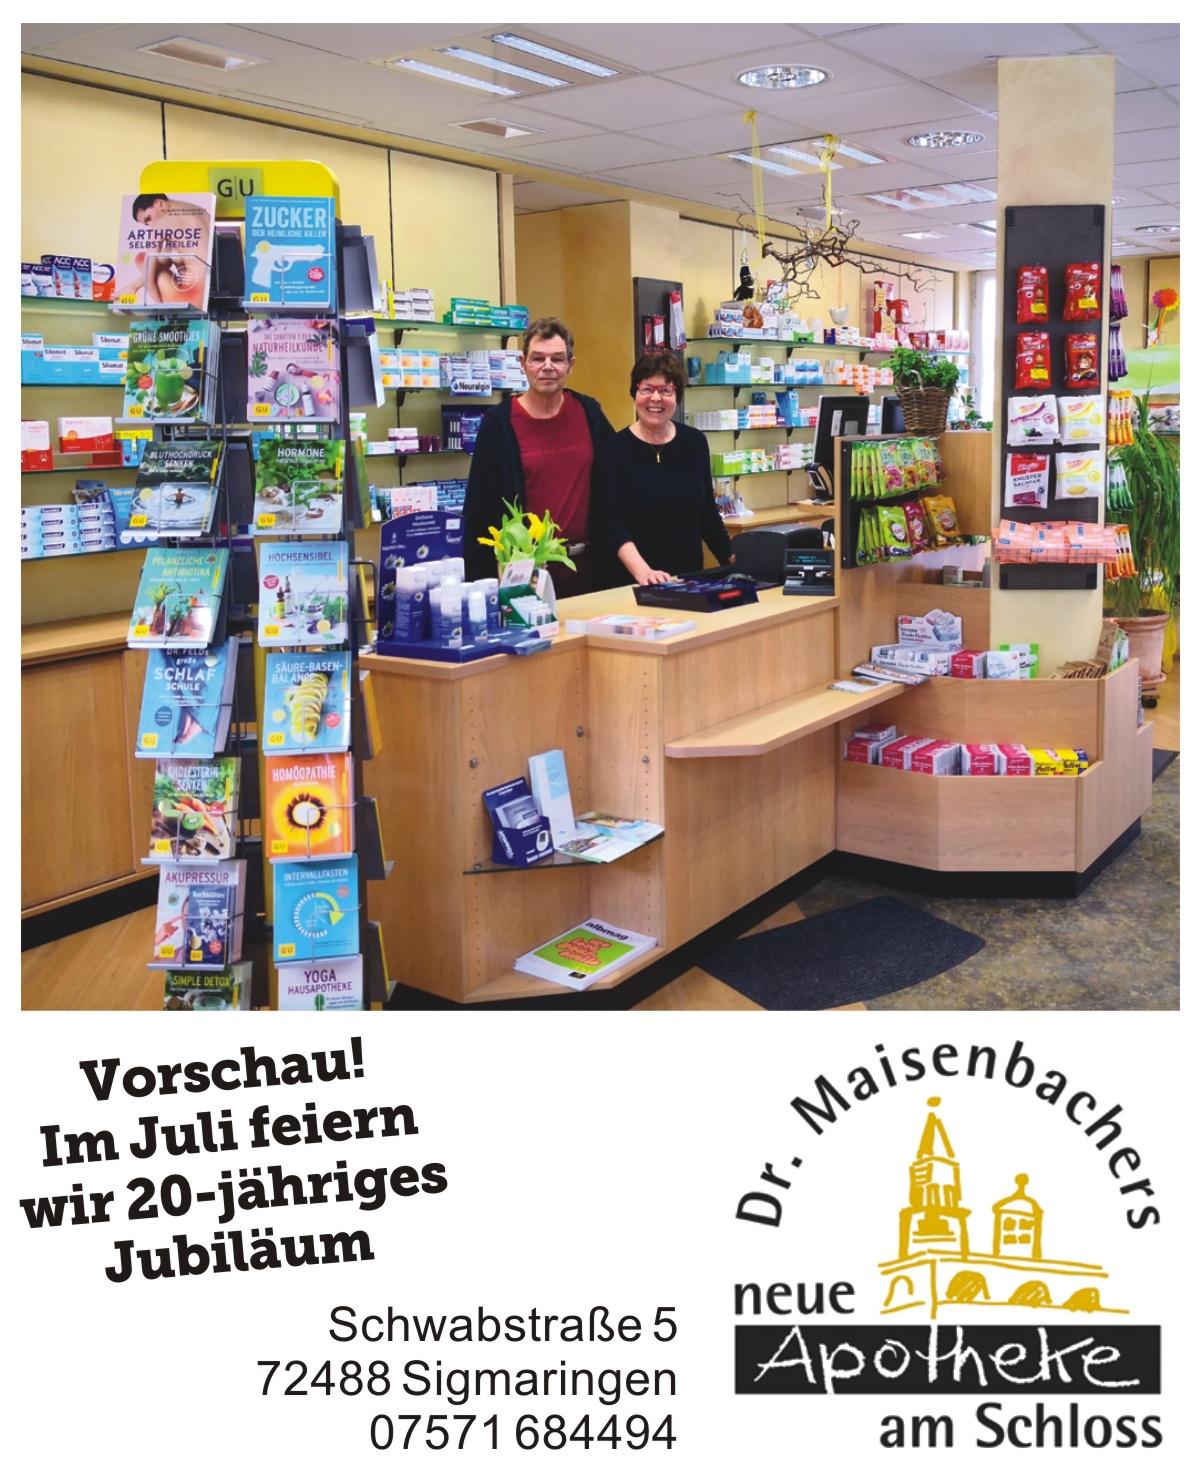 dr-maisenbachers-neue-apotheke-01